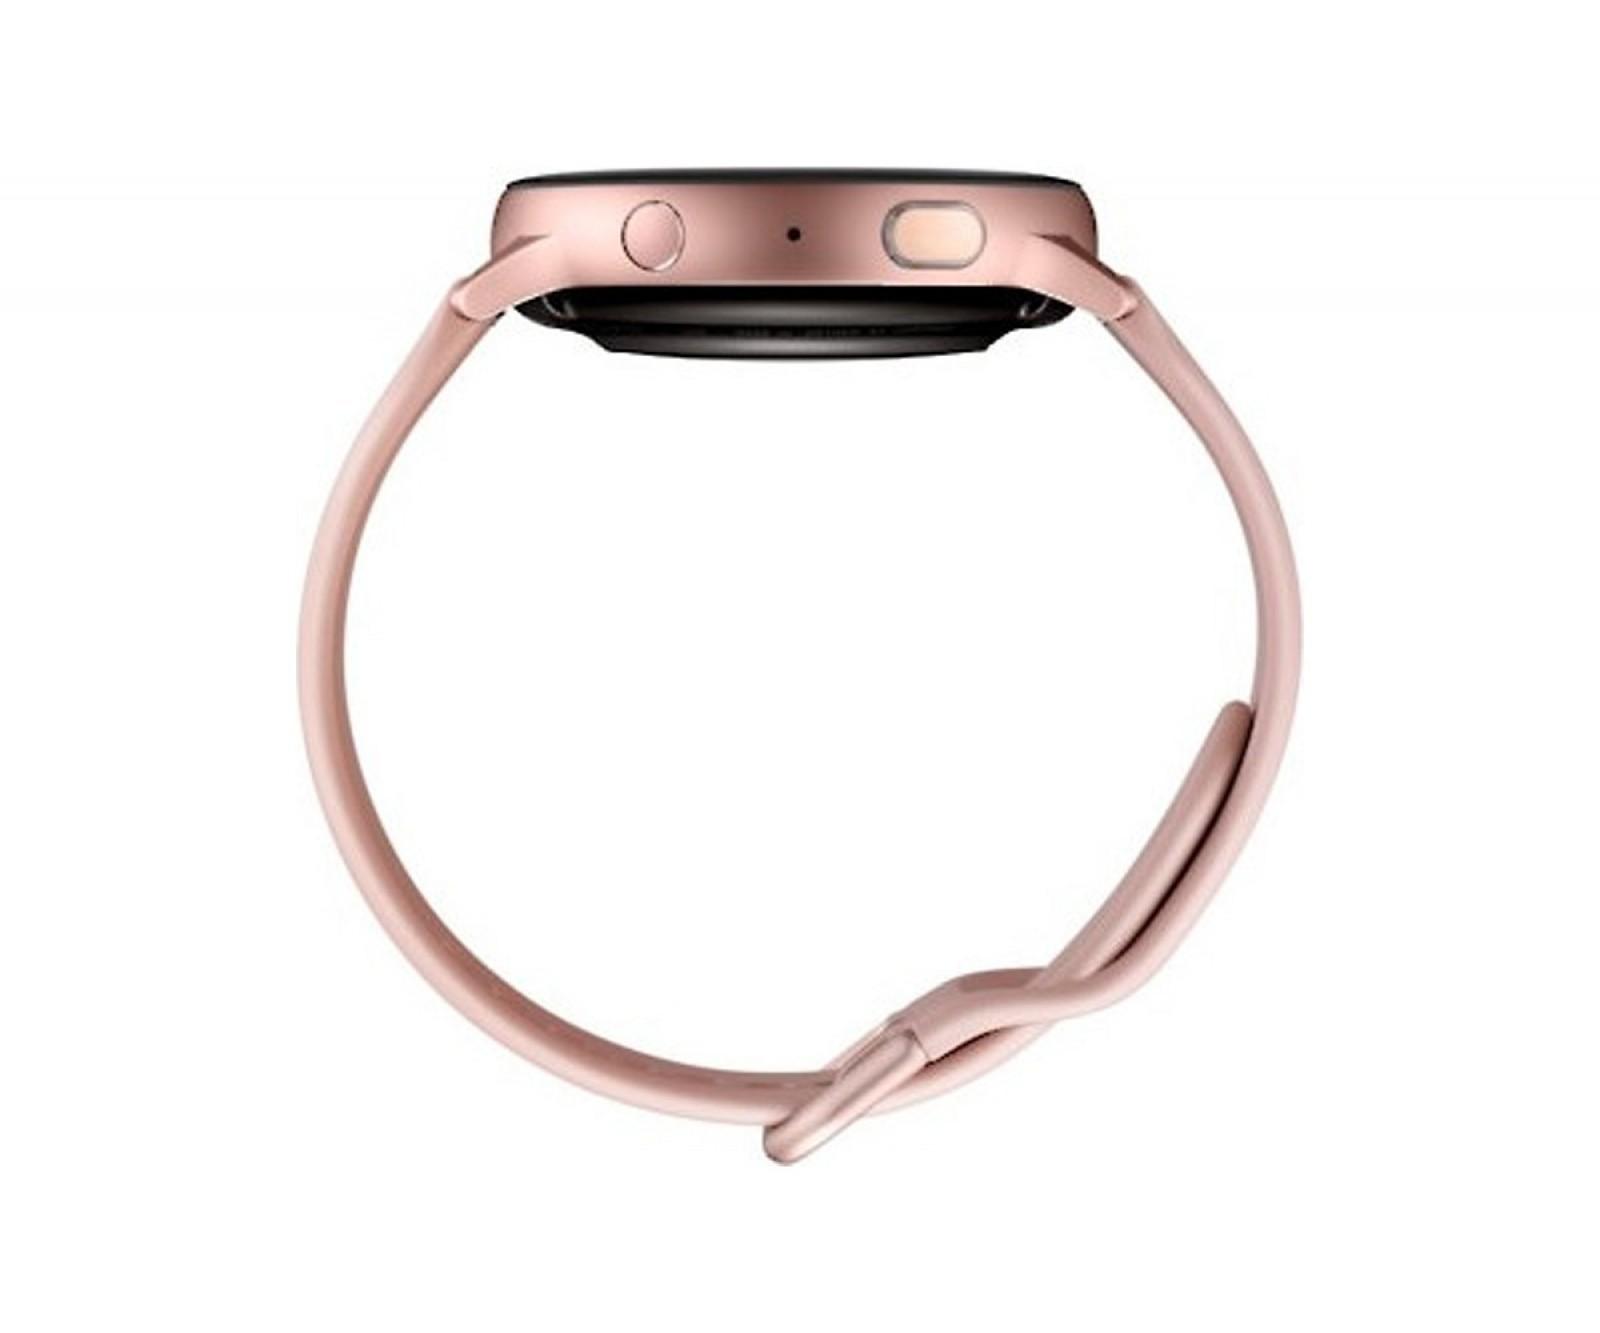 Samsung Galaxy Watch Active2 (Rose Gold)